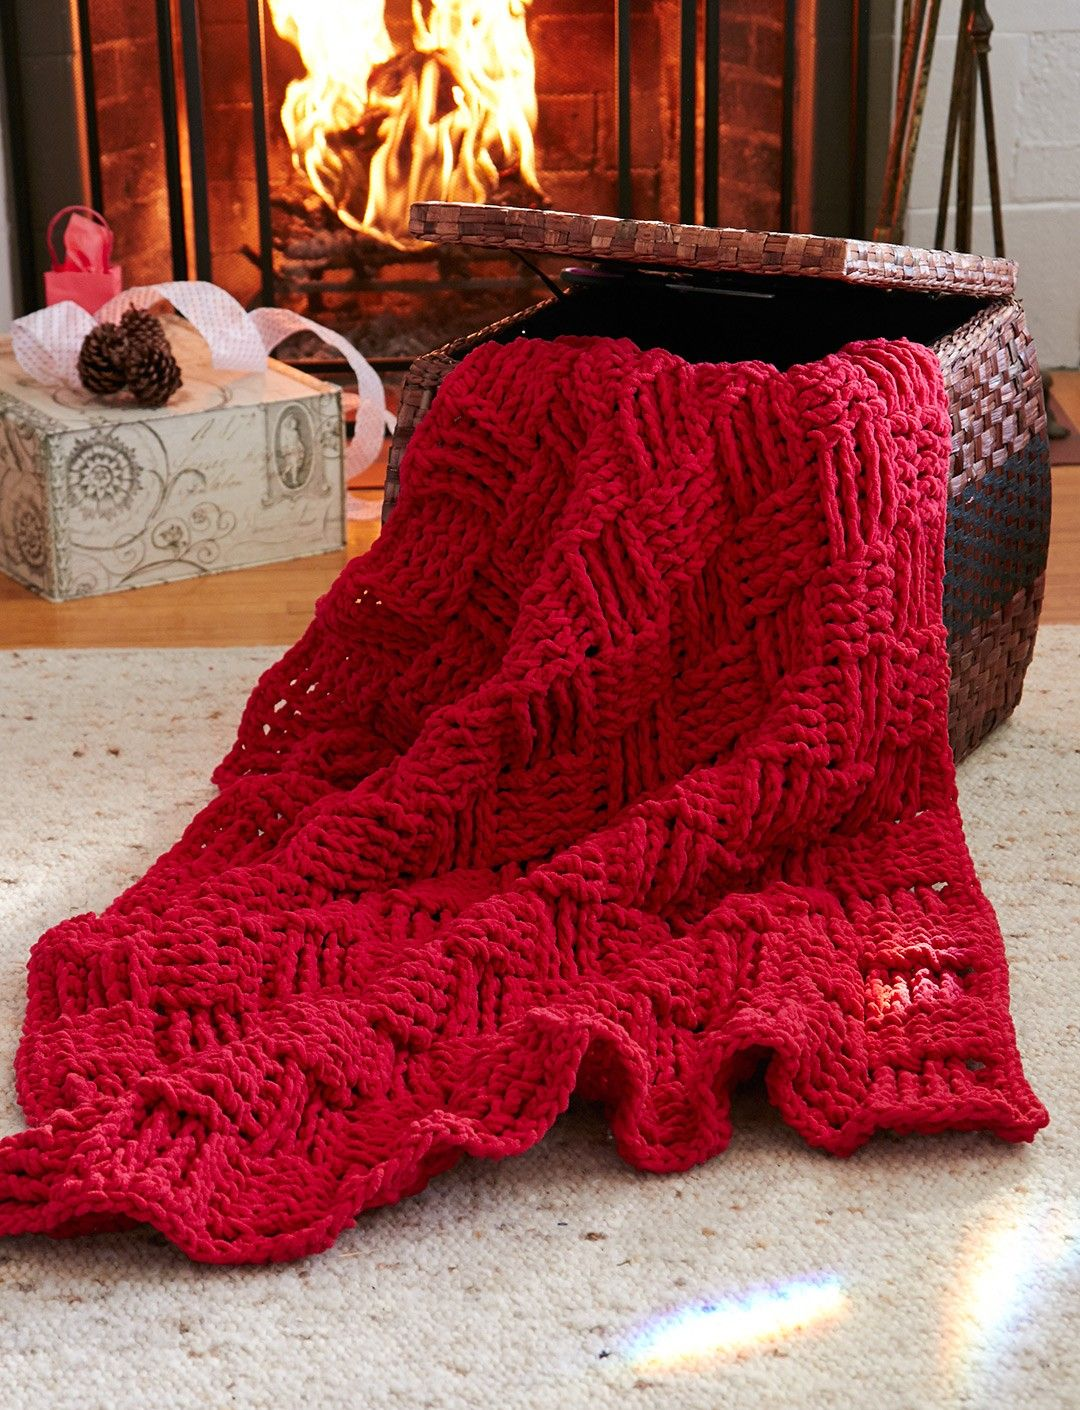 Basketweave afghan free crochet afghan pattern crochet basketweave afghan free crochet afghan pattern bankloansurffo Image collections